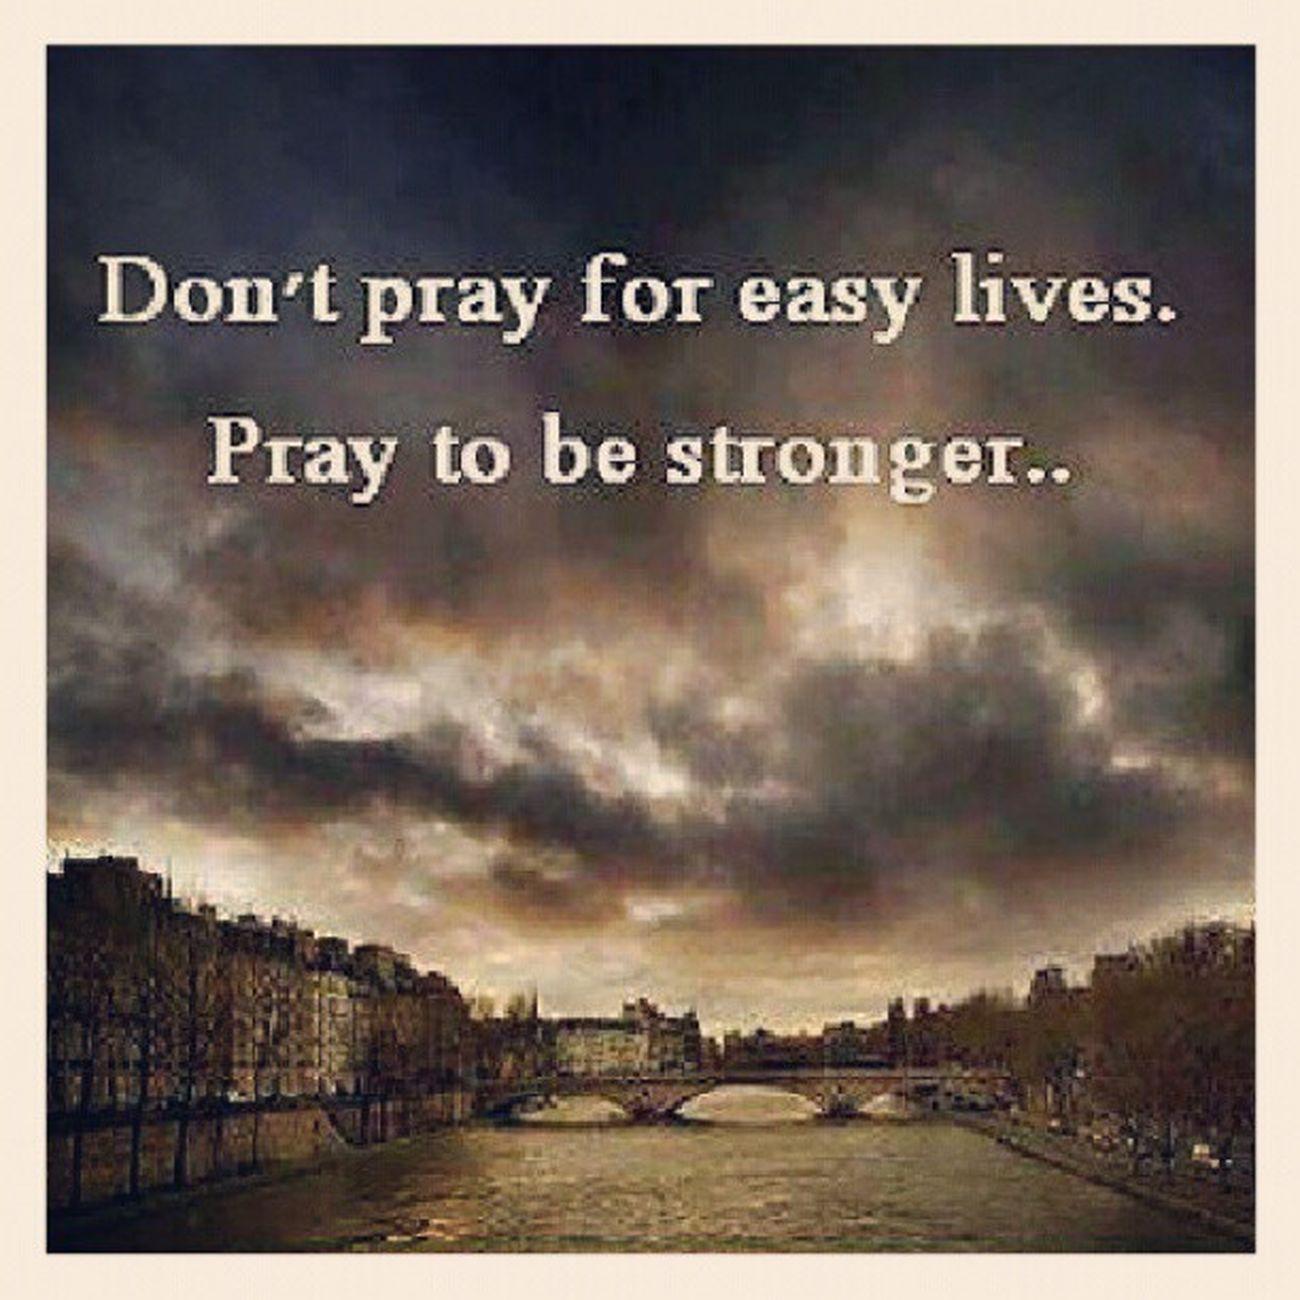 Be strong! Positiveoutlooks